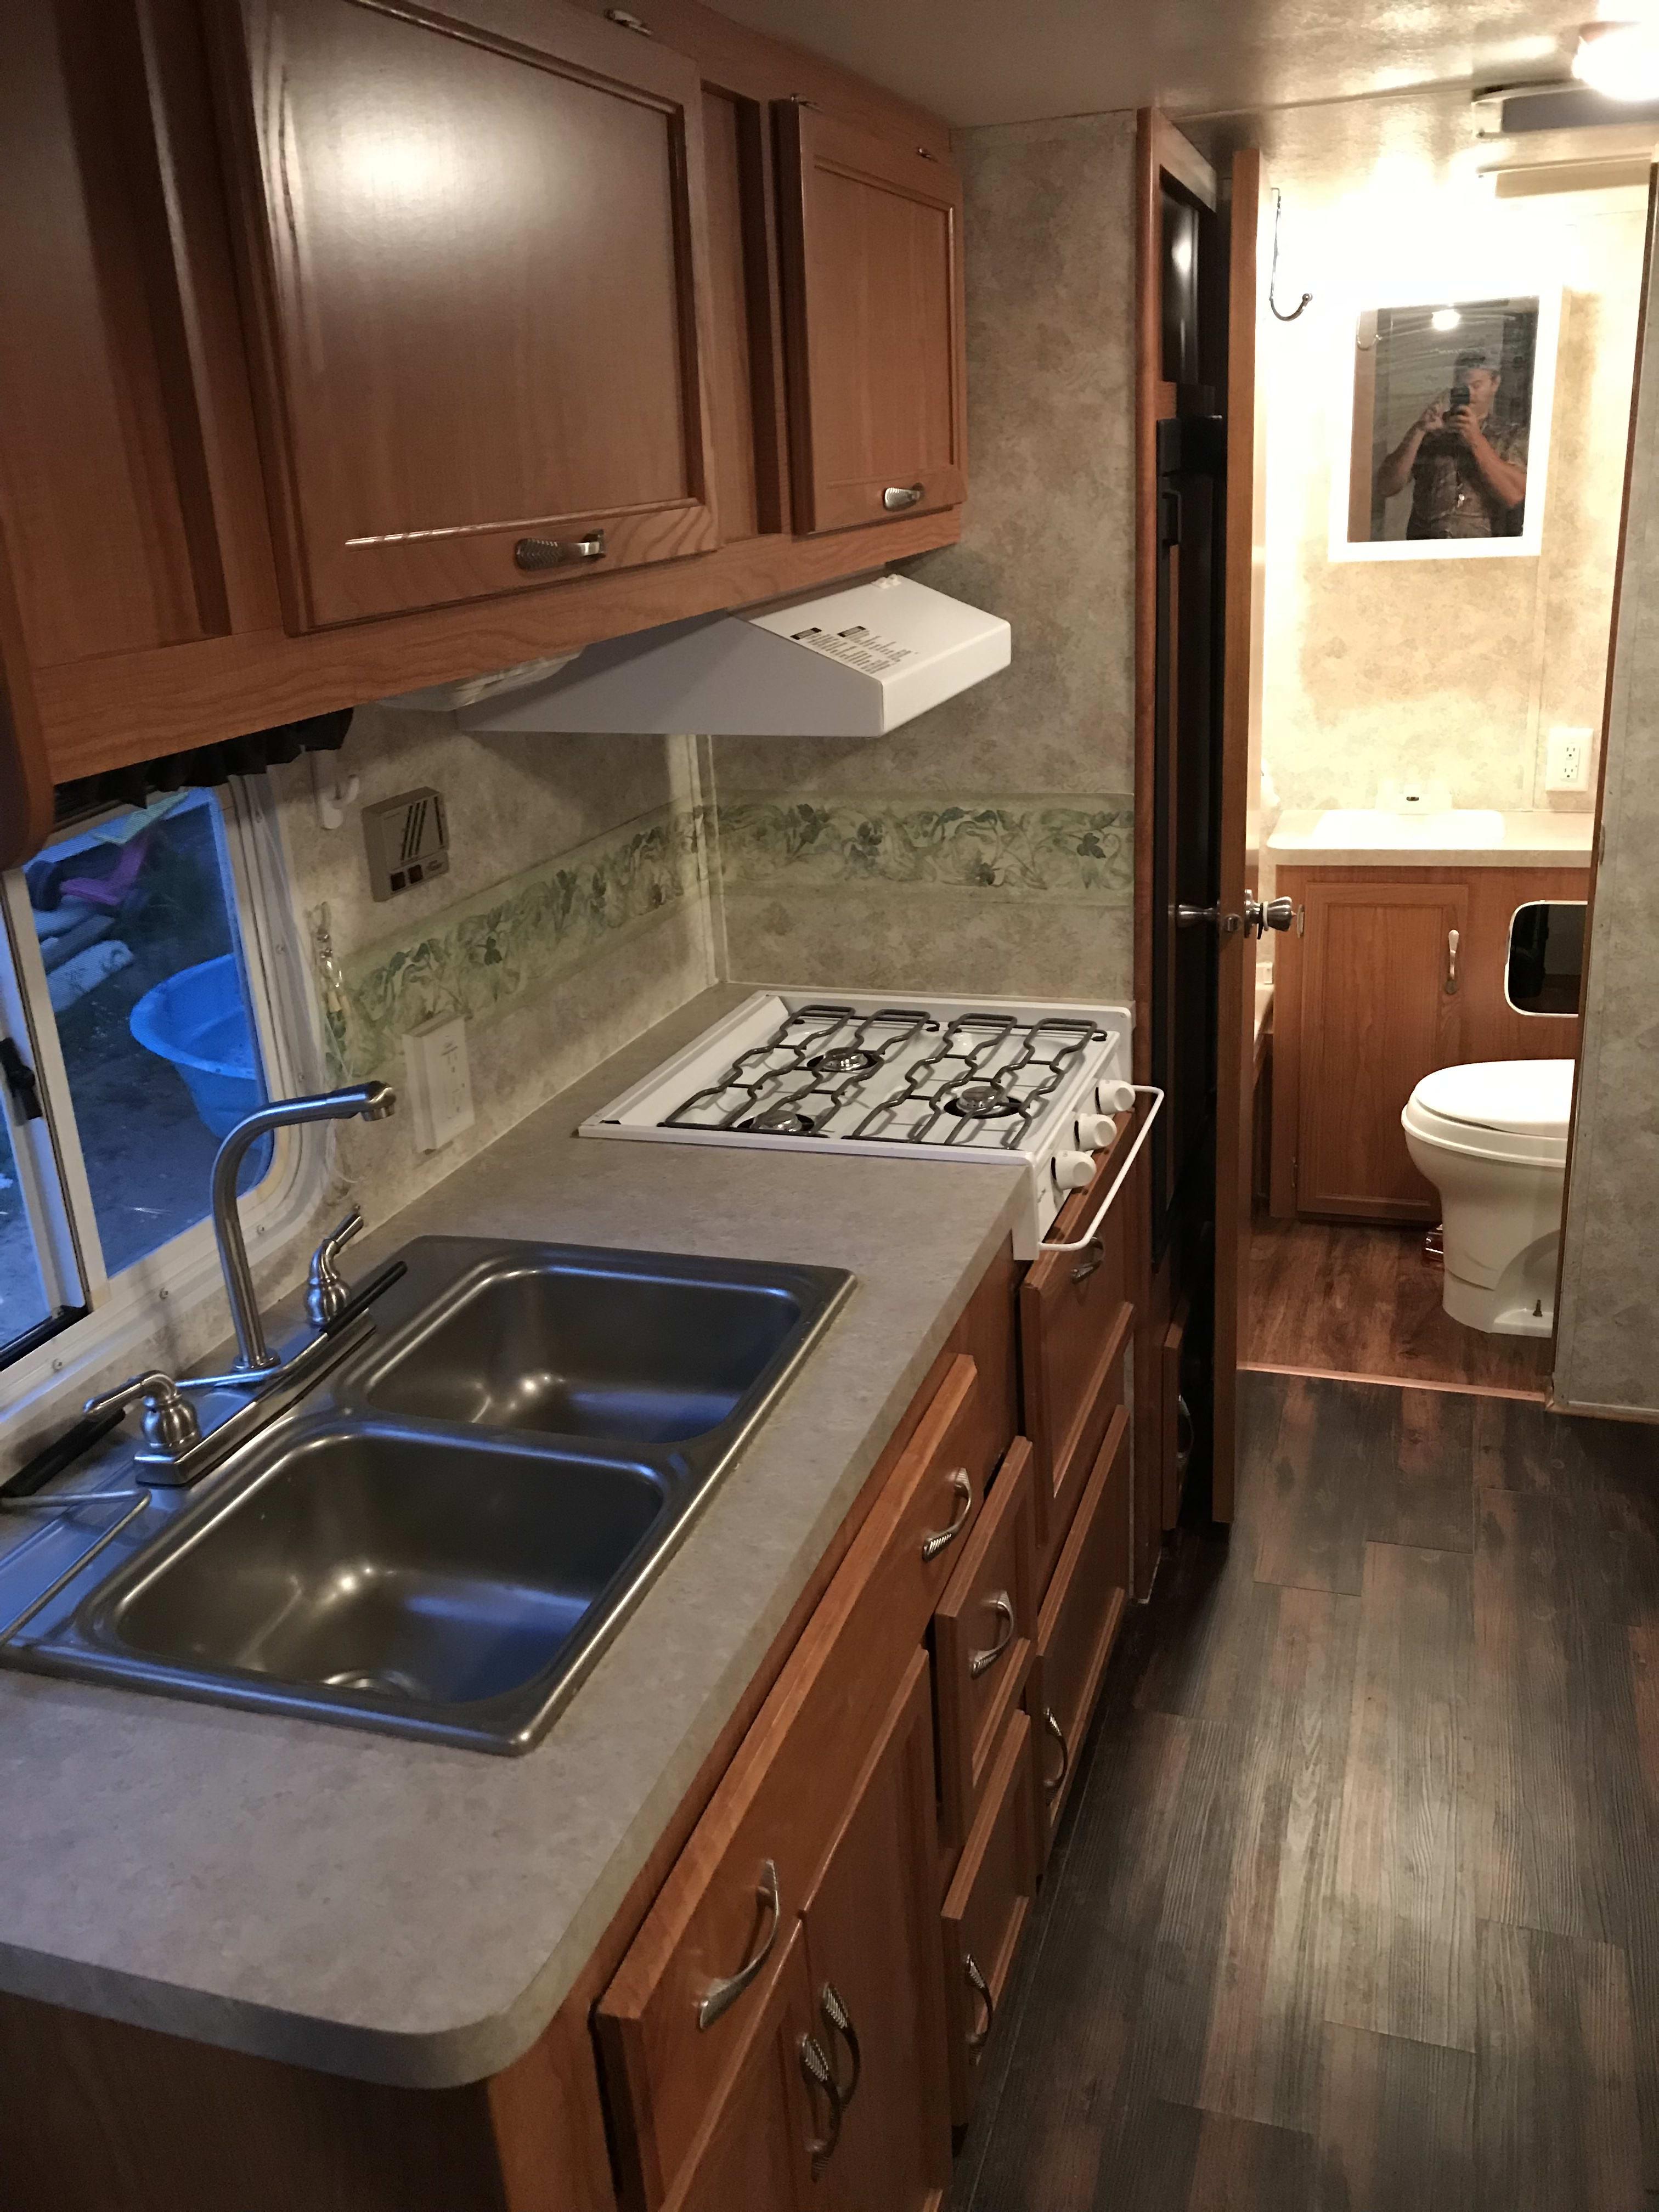 Kitchen and Bathroom. Coachmen Spirit Of America 2004